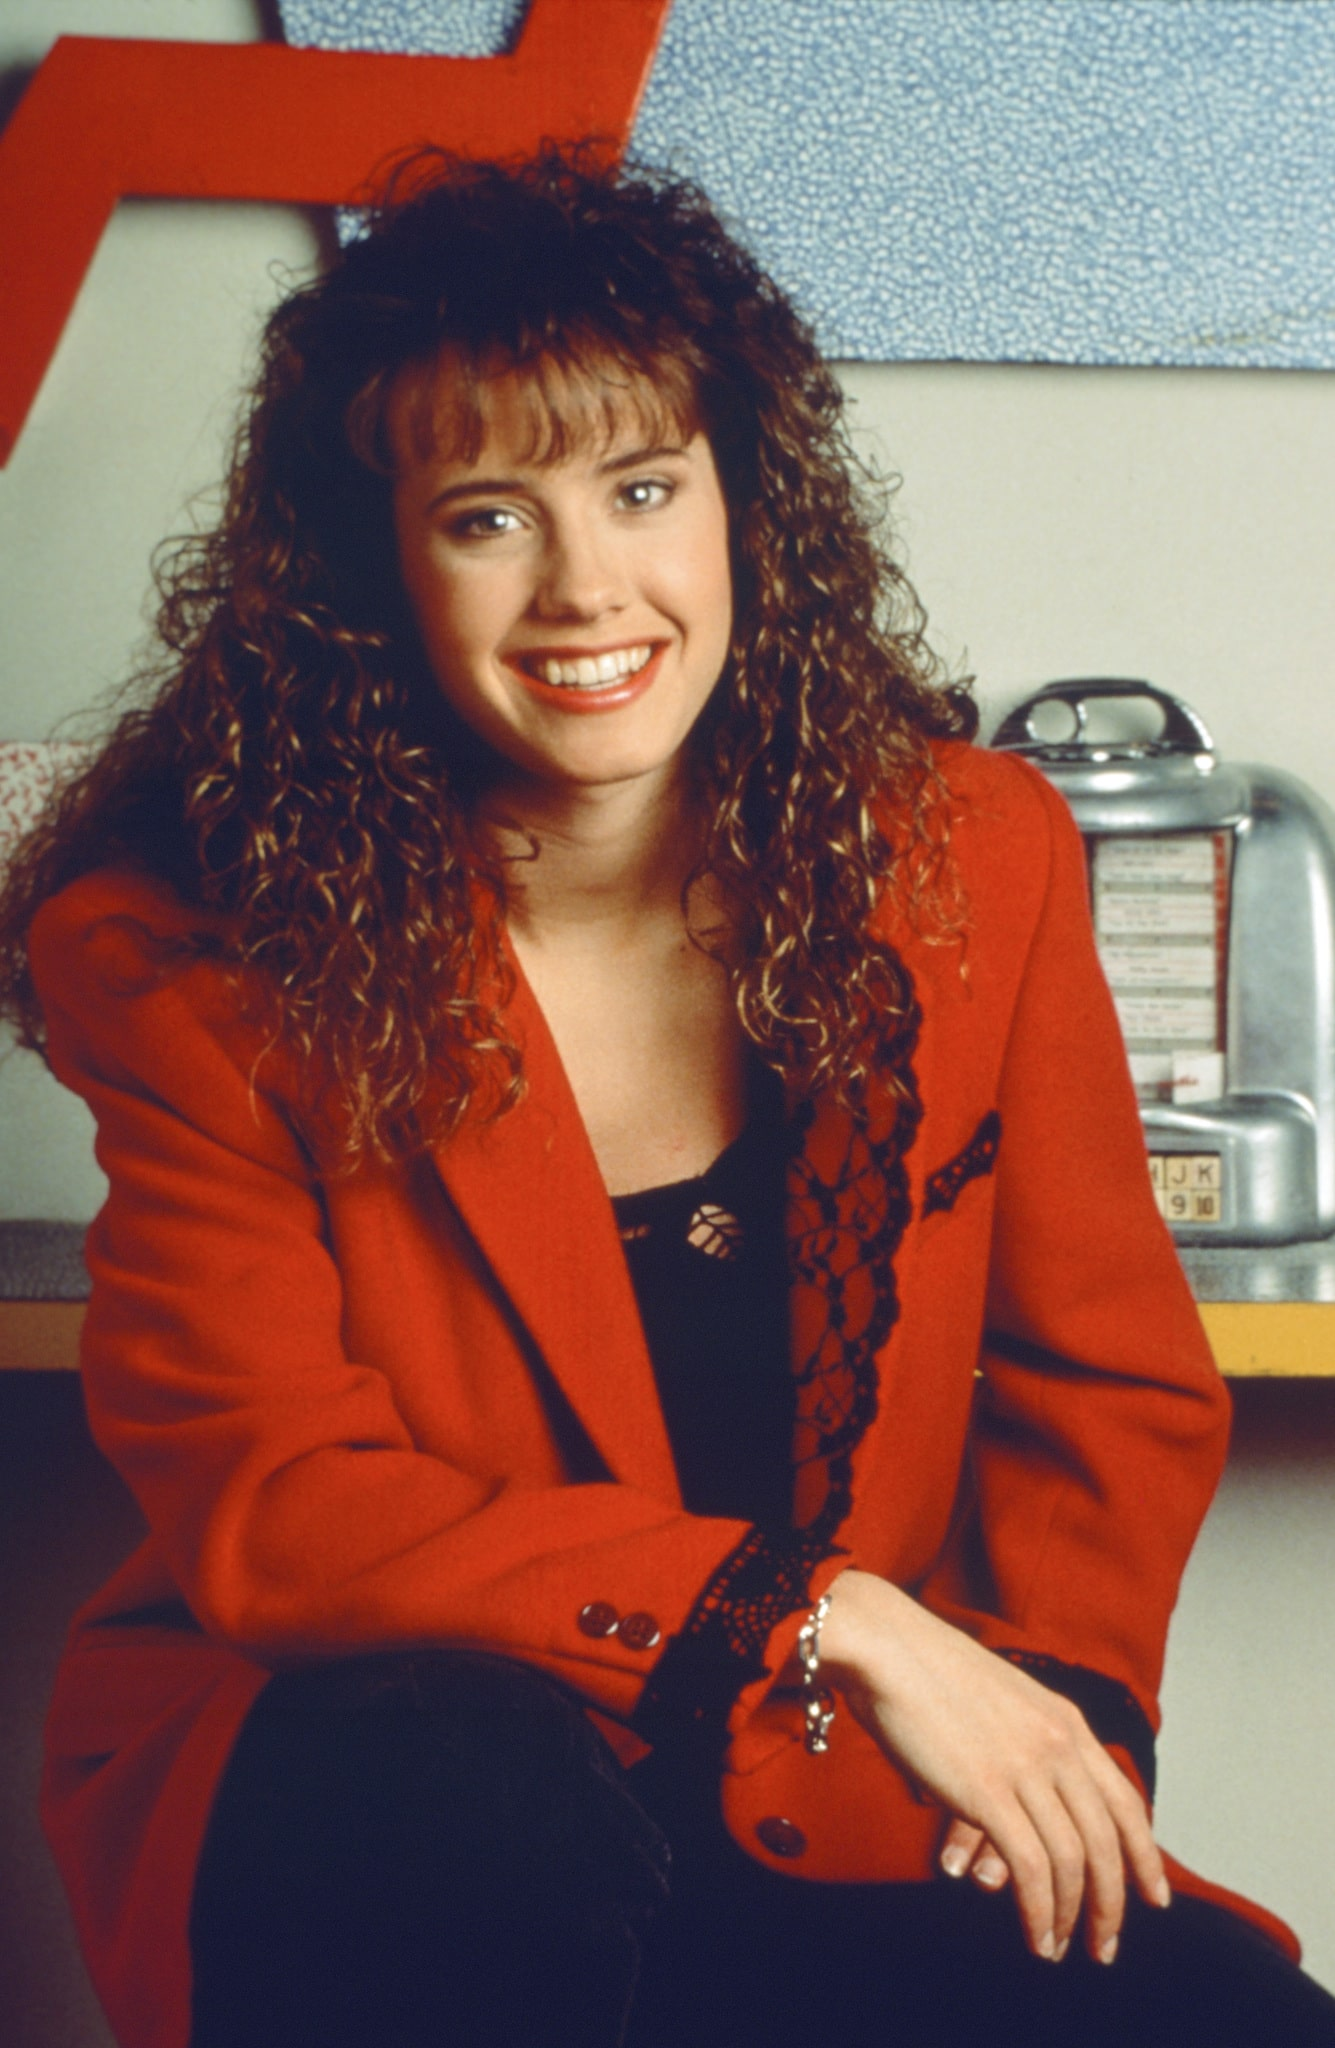 Leanna Creel American Actress, Producer, Director, Screenwriter, Photographer